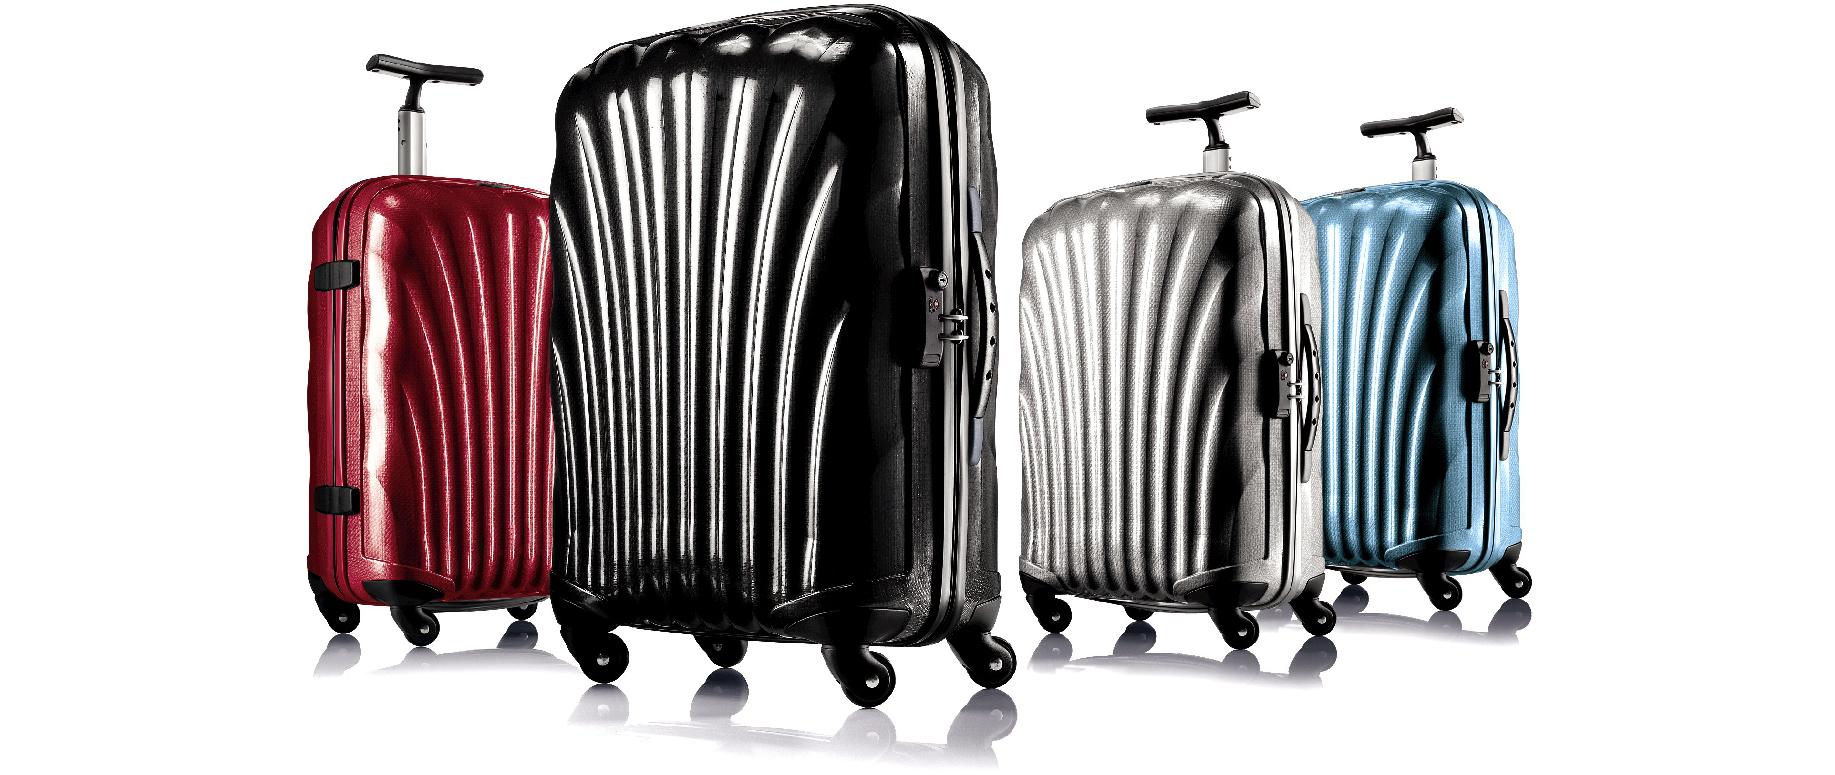 Samsonite Luggages